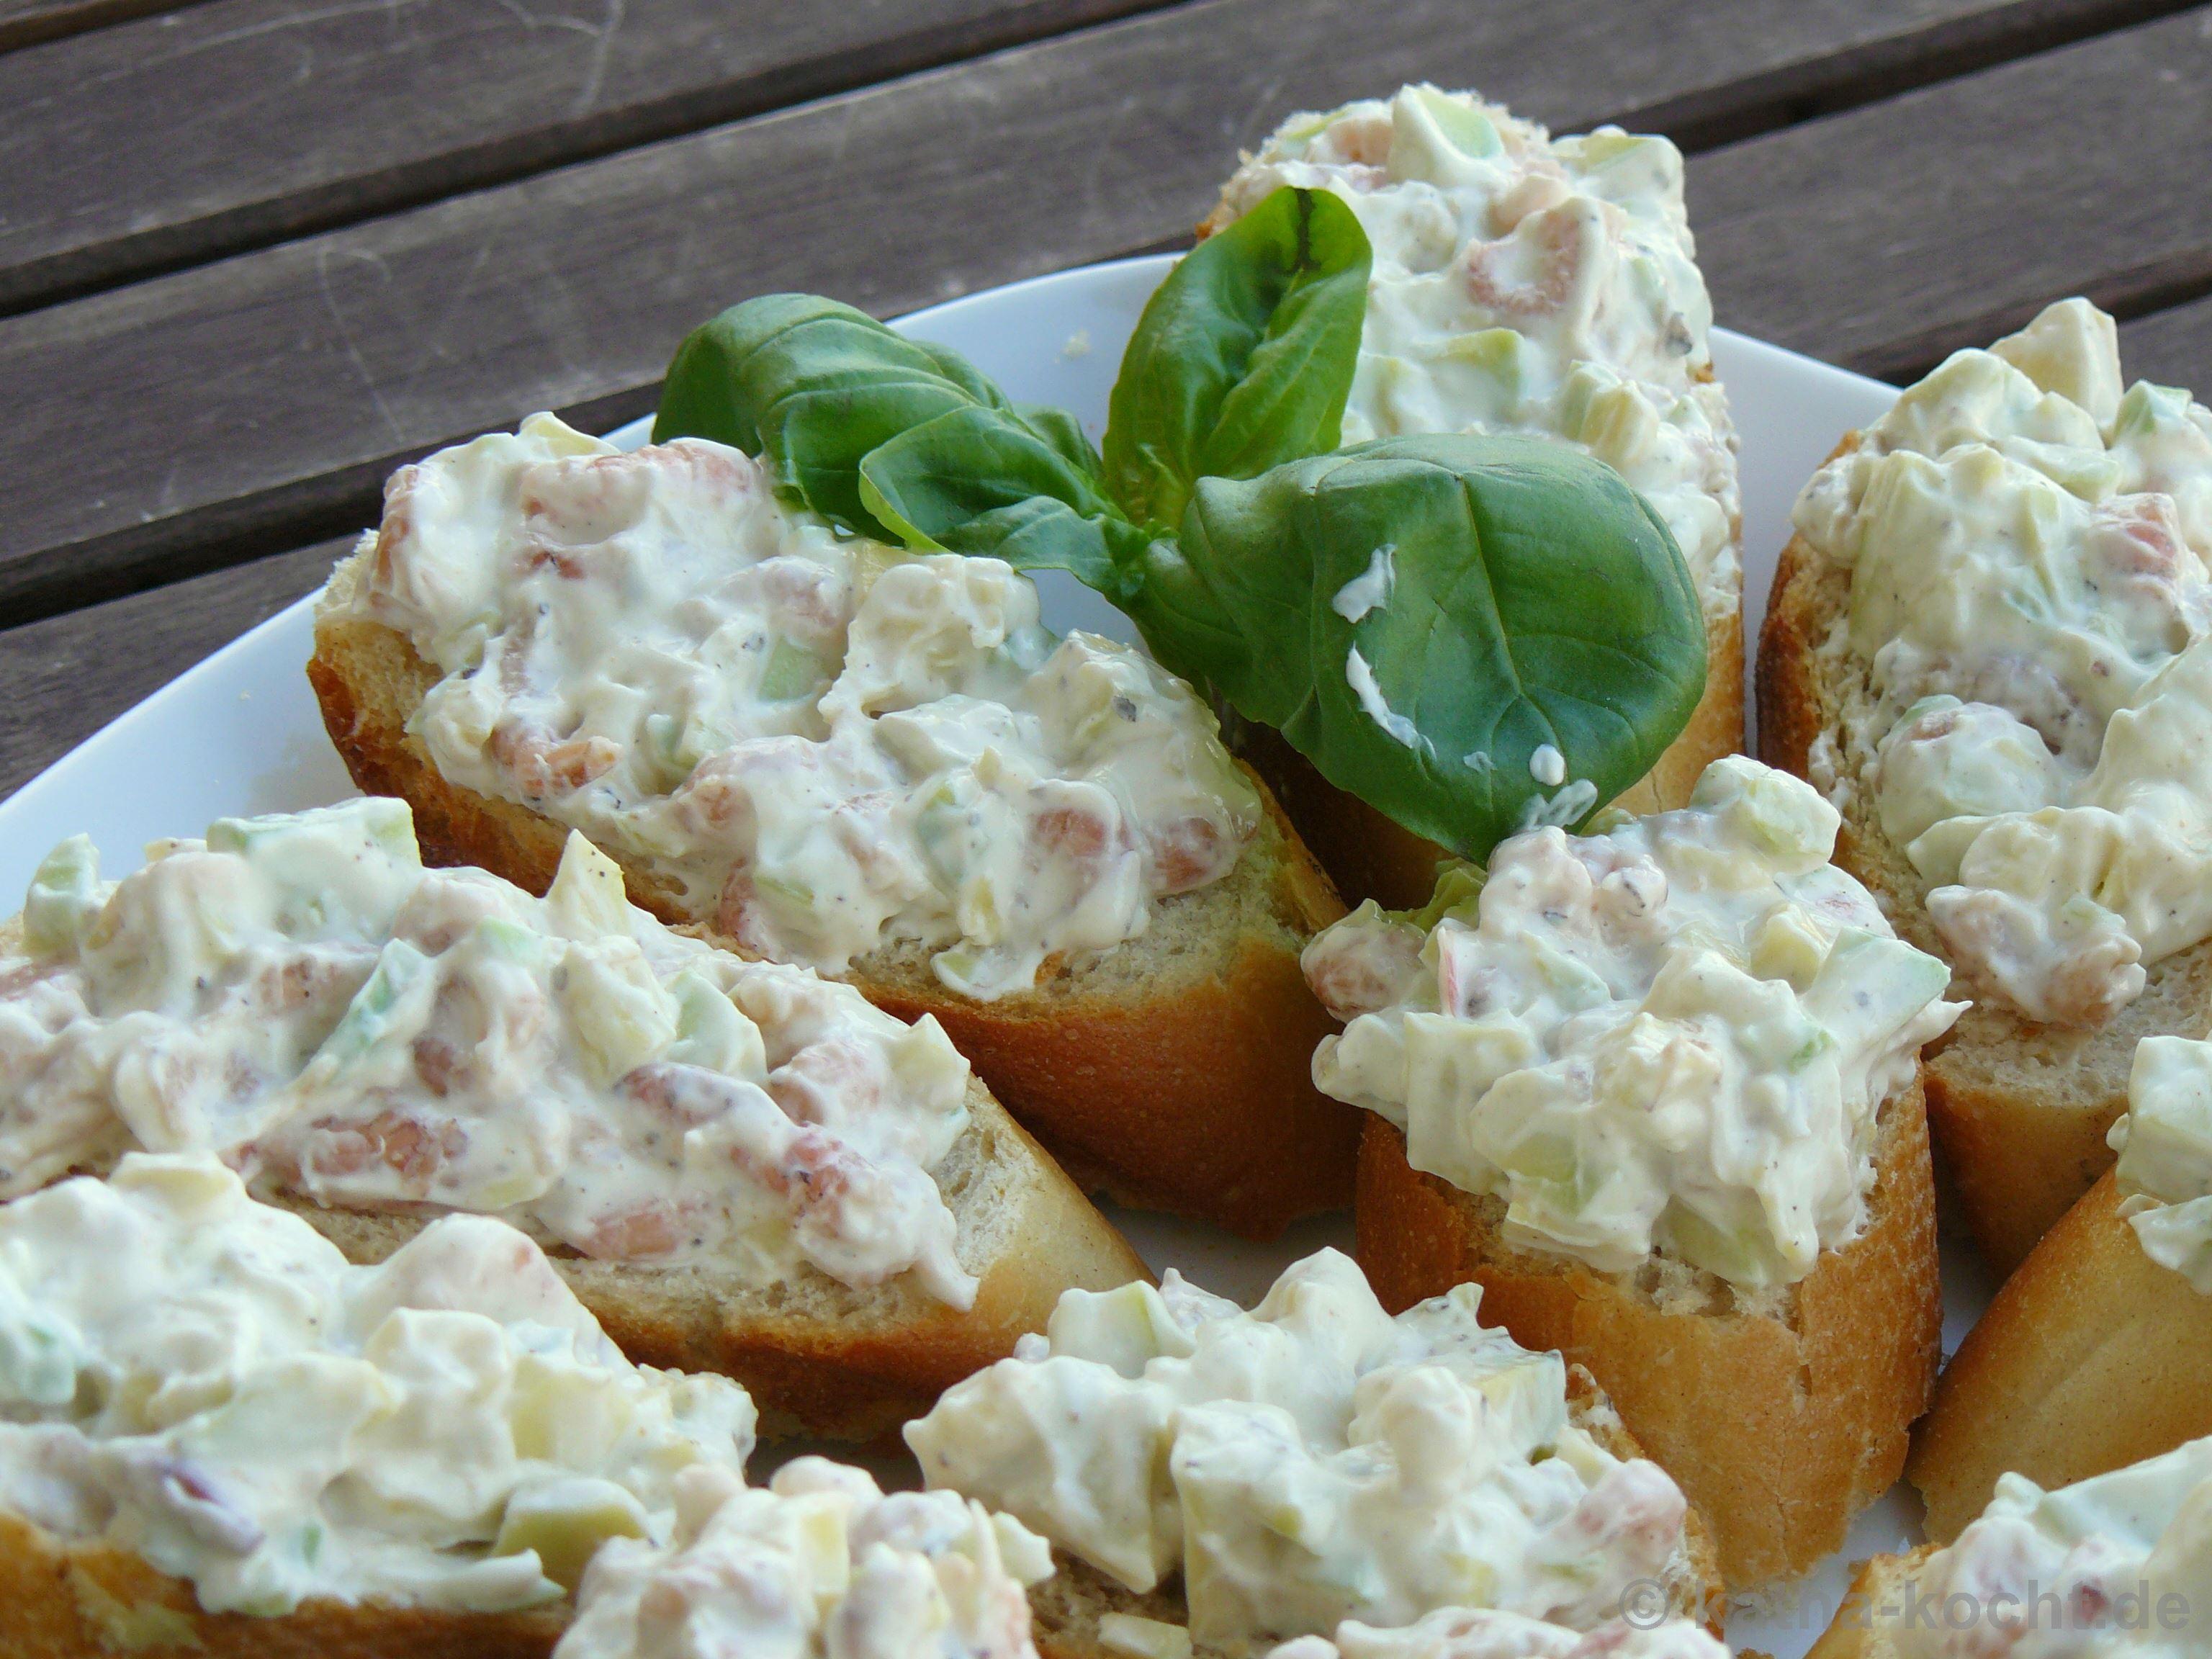 krabben birnen salat rezepte suchen. Black Bedroom Furniture Sets. Home Design Ideas